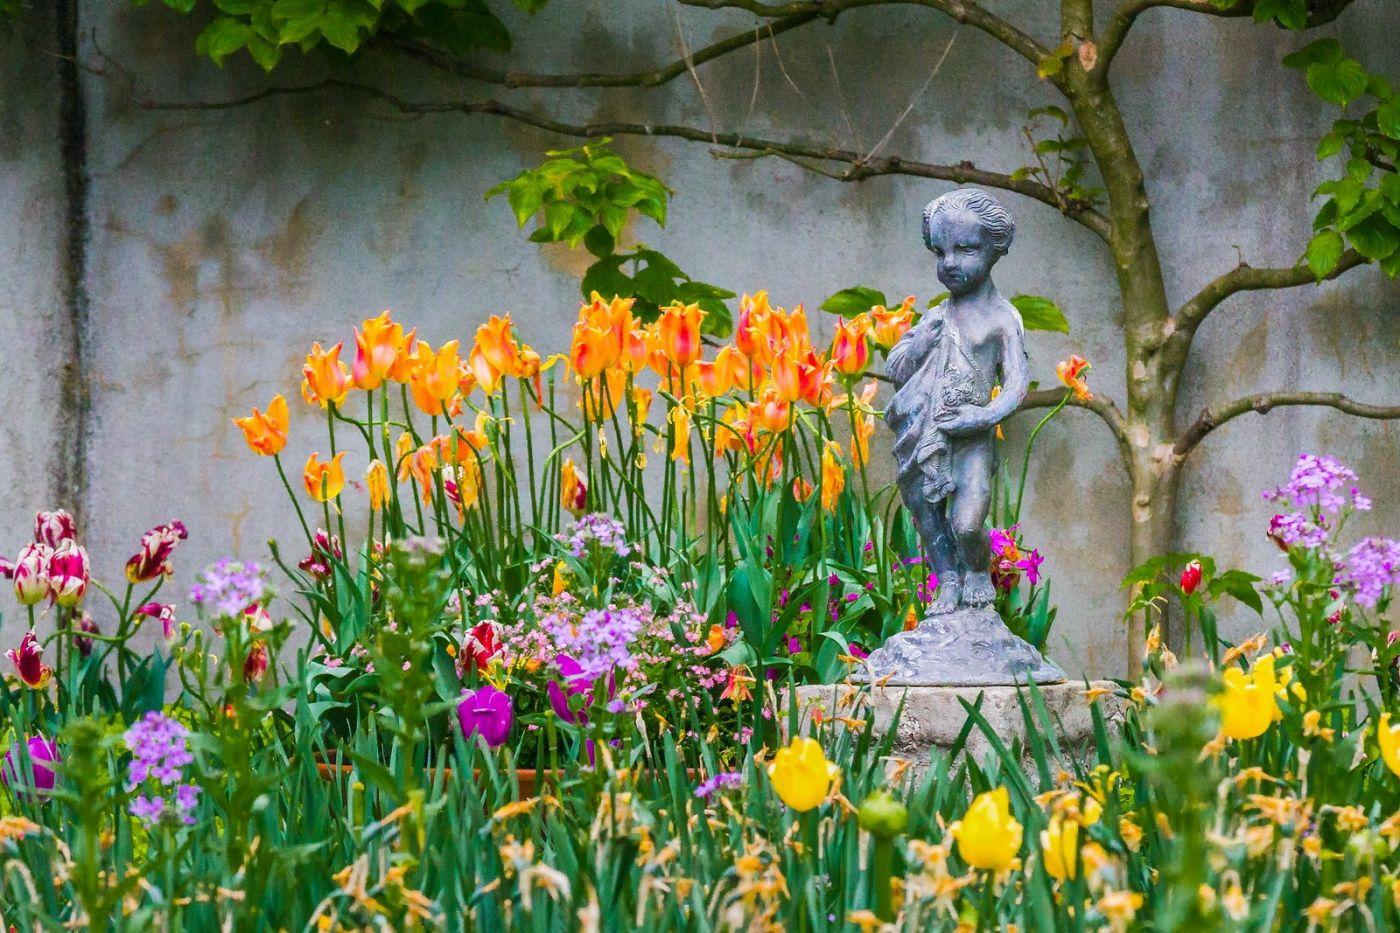 Chanticleer花园,有梦想的季节_图1-20